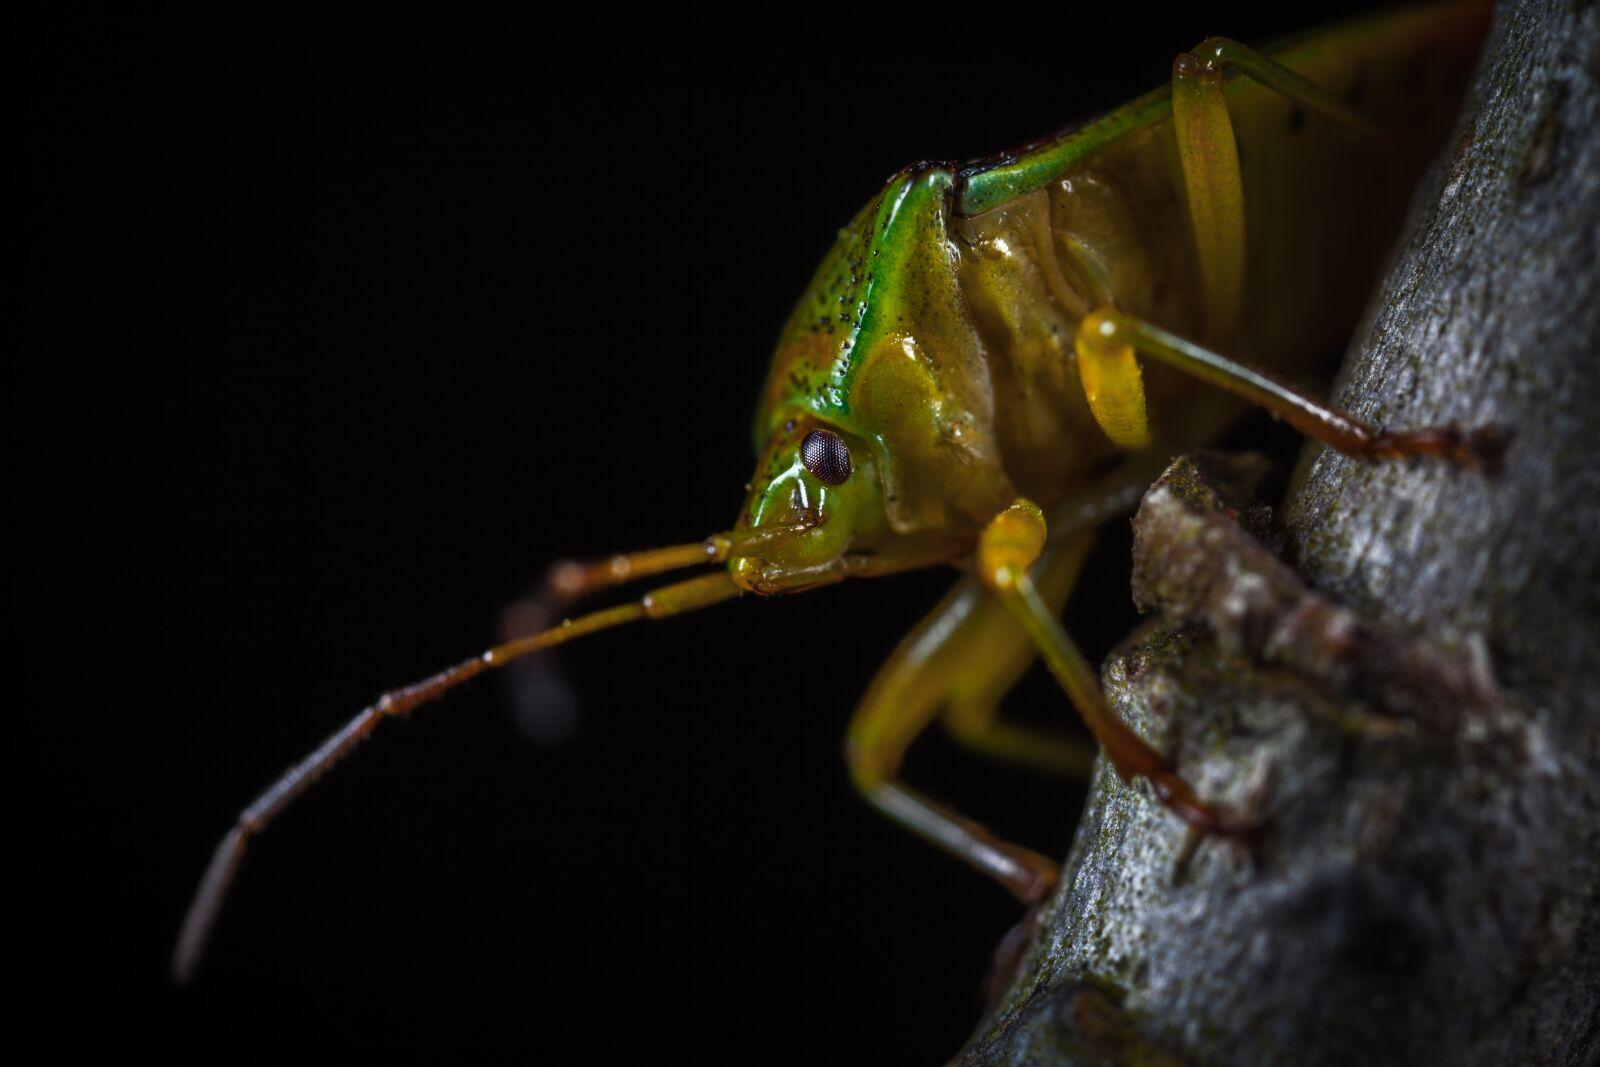 insect, bespozvonochnoe, living nature photography